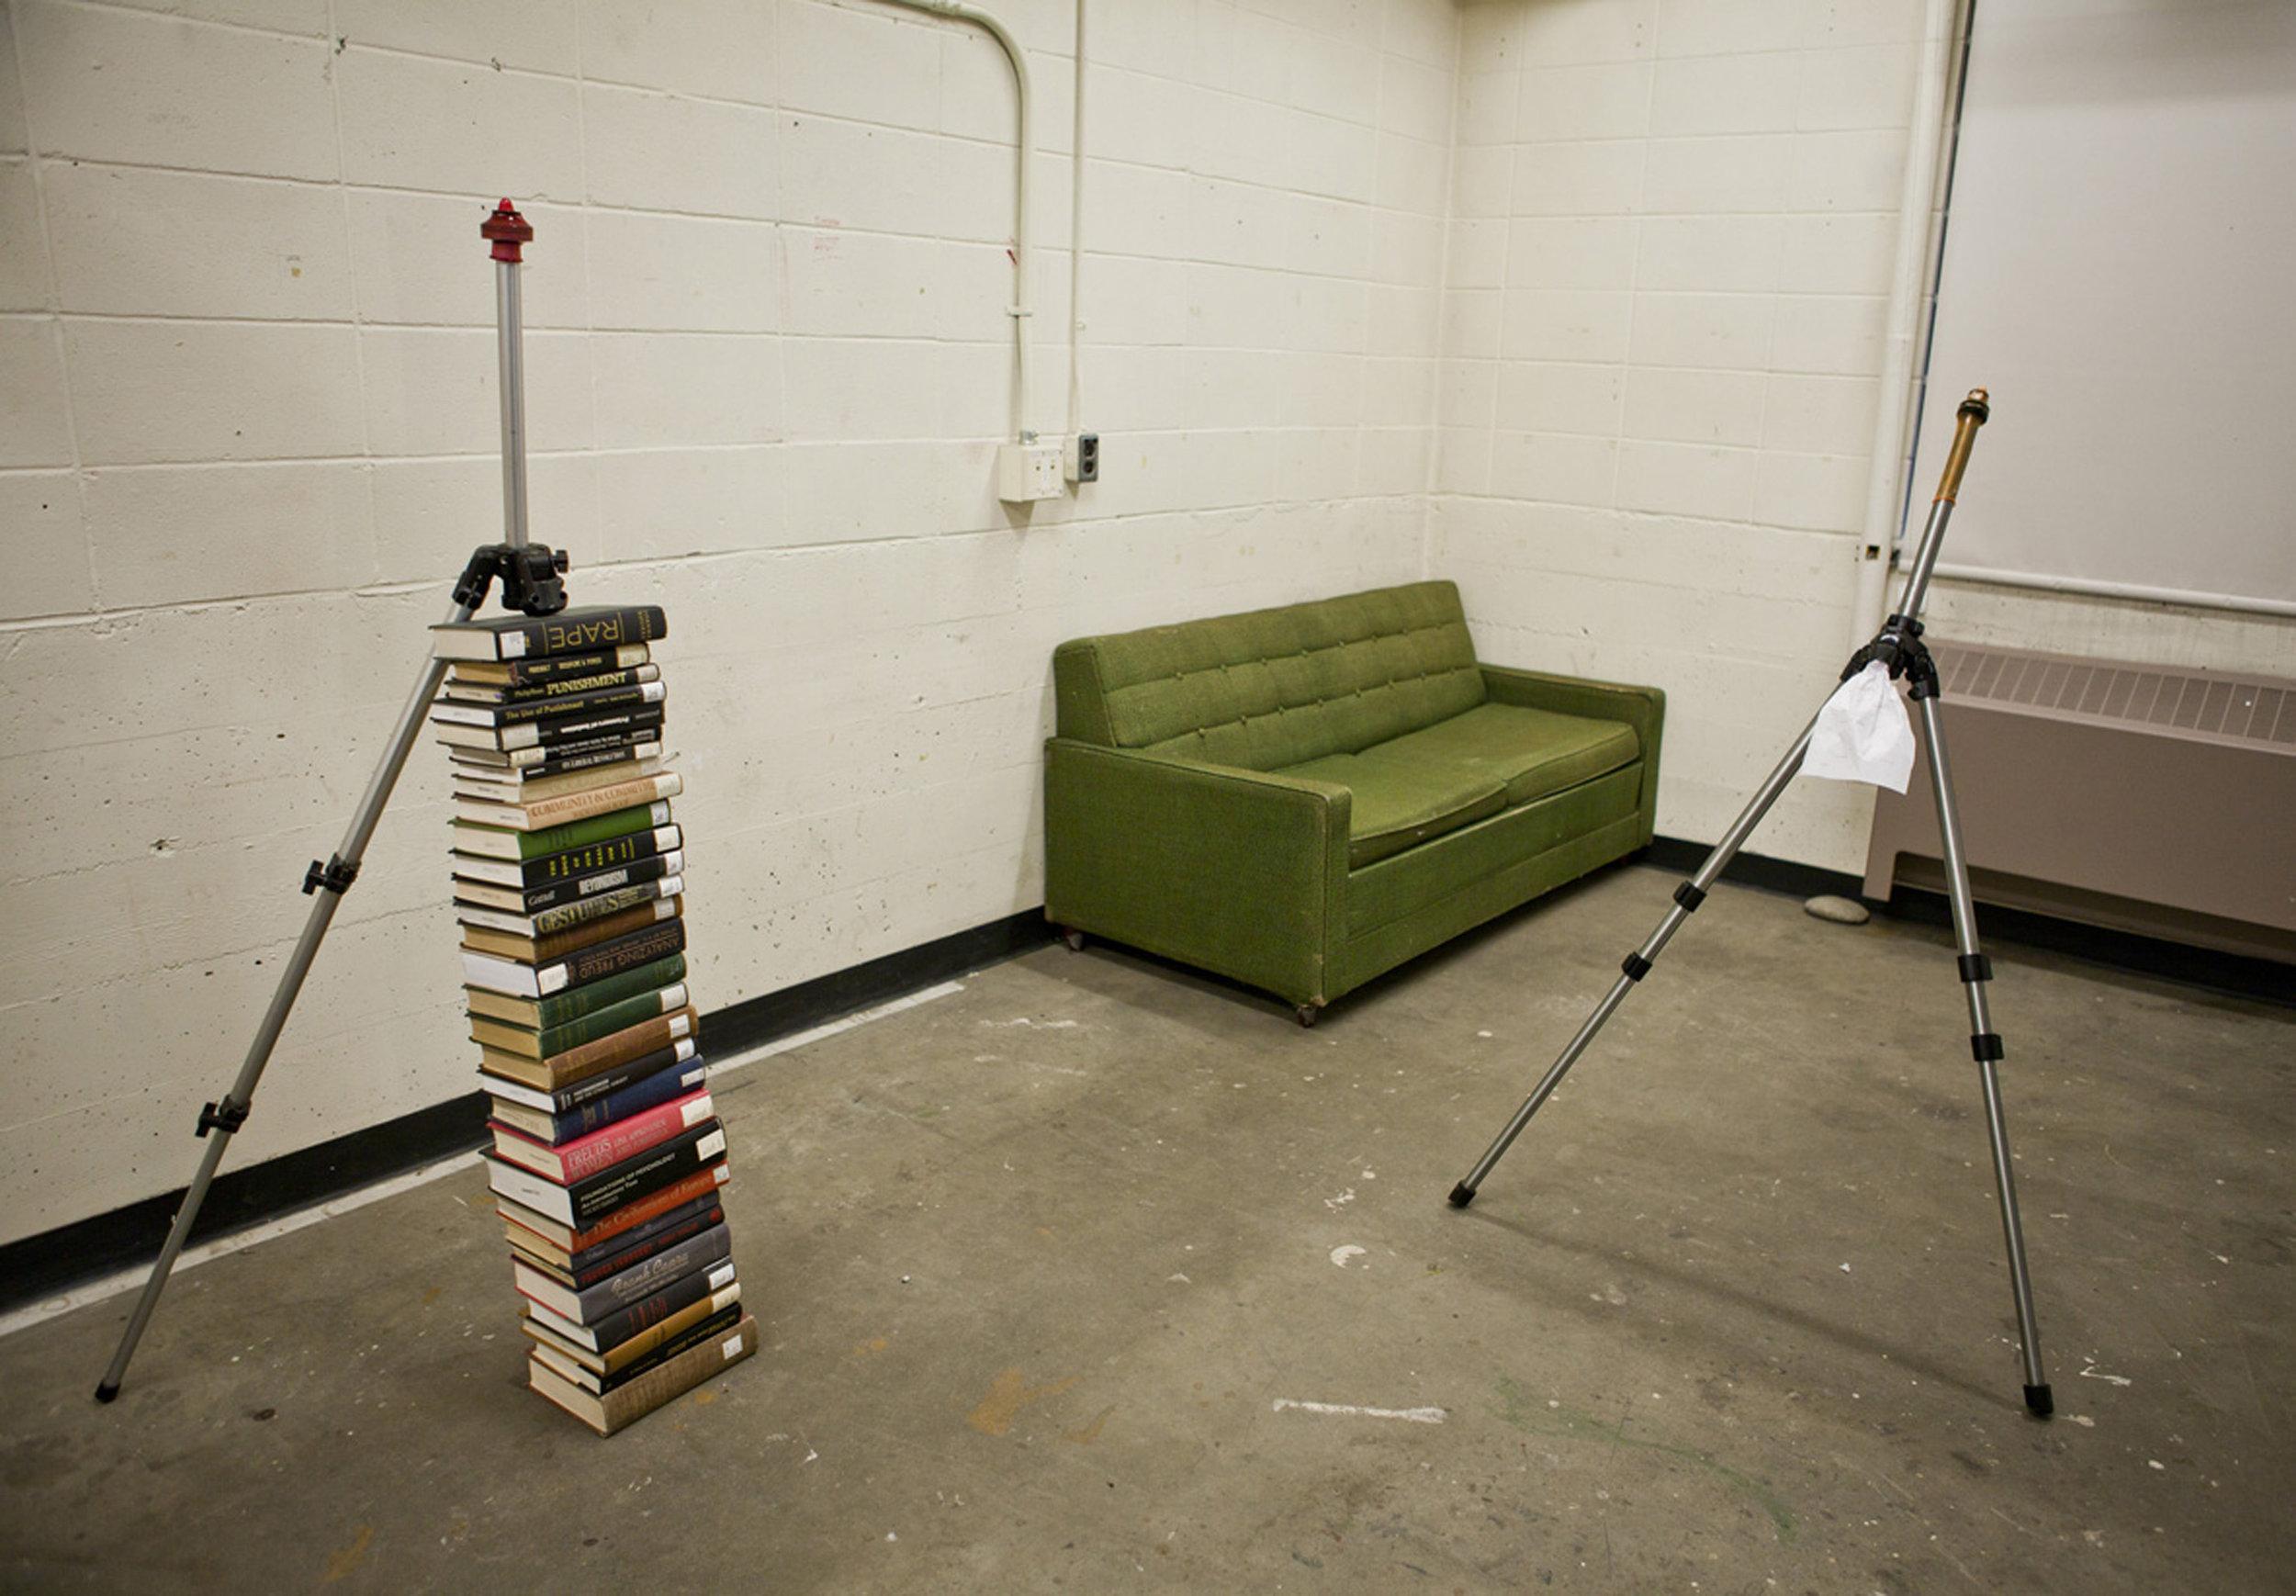 aluminum tripod, book, latex condom, 200 x 80 x 70 cm (Installation view)